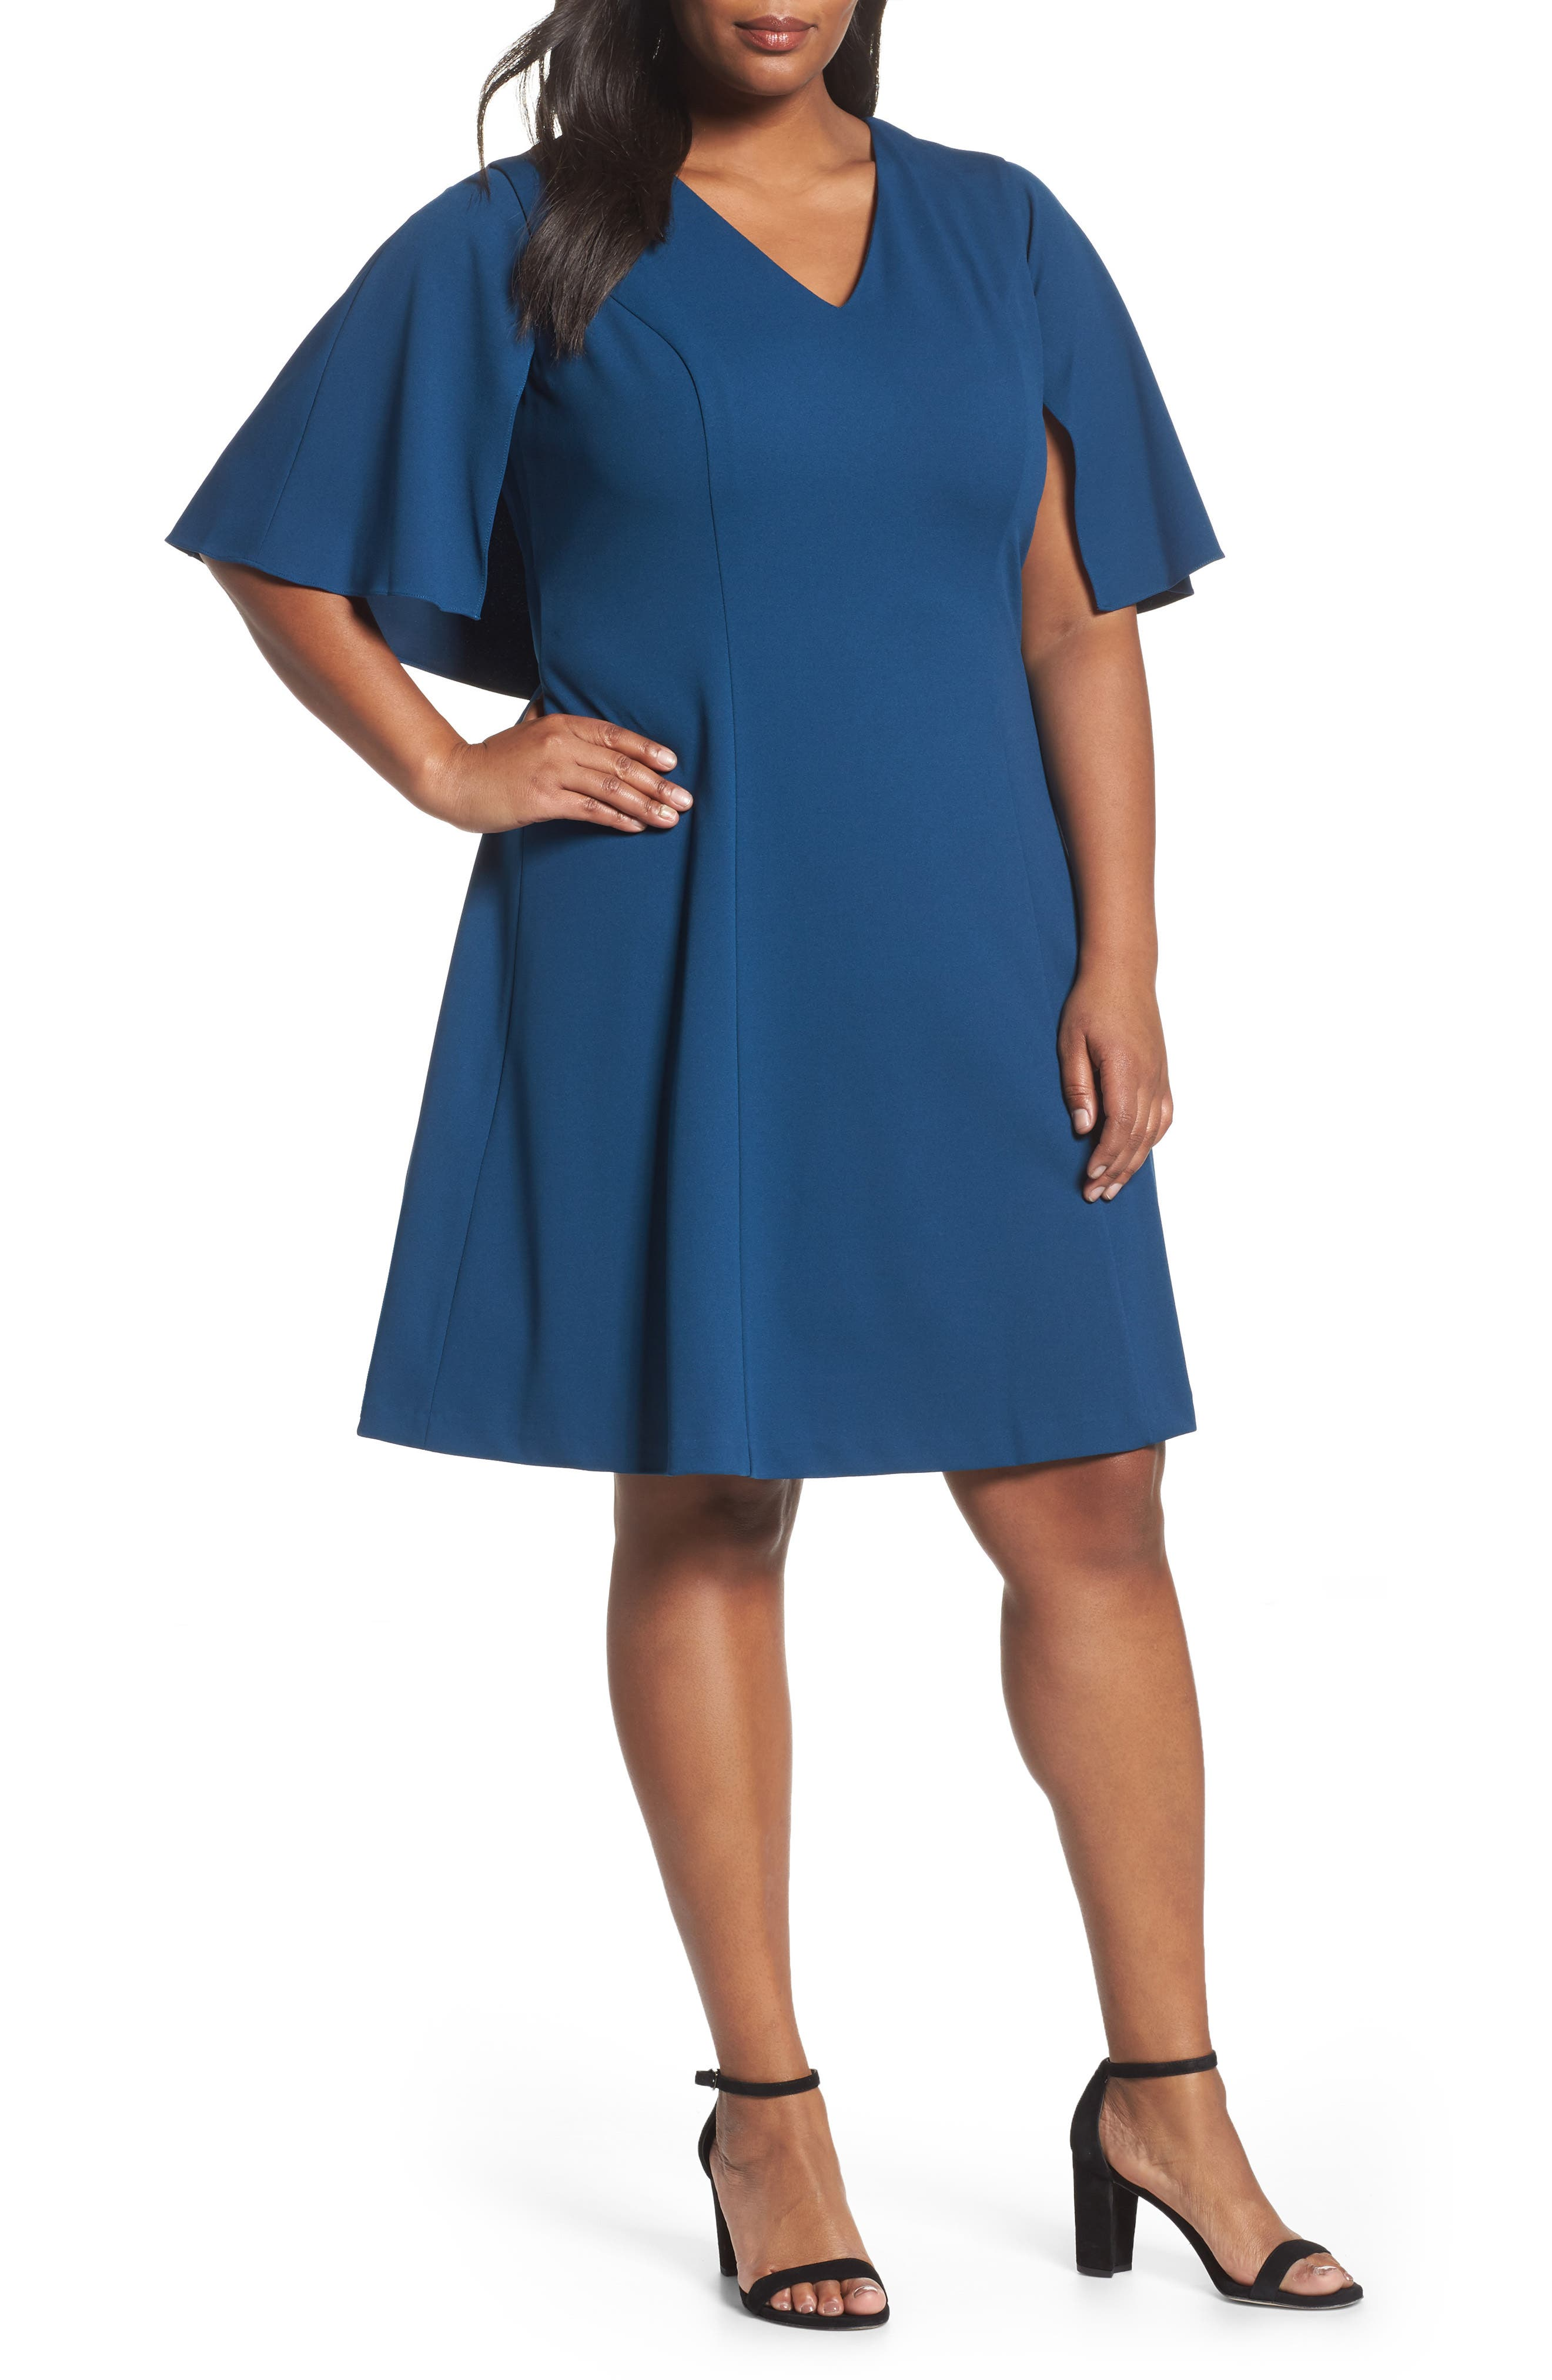 Capelet A-Line Dress,                         Main,                         color, 471